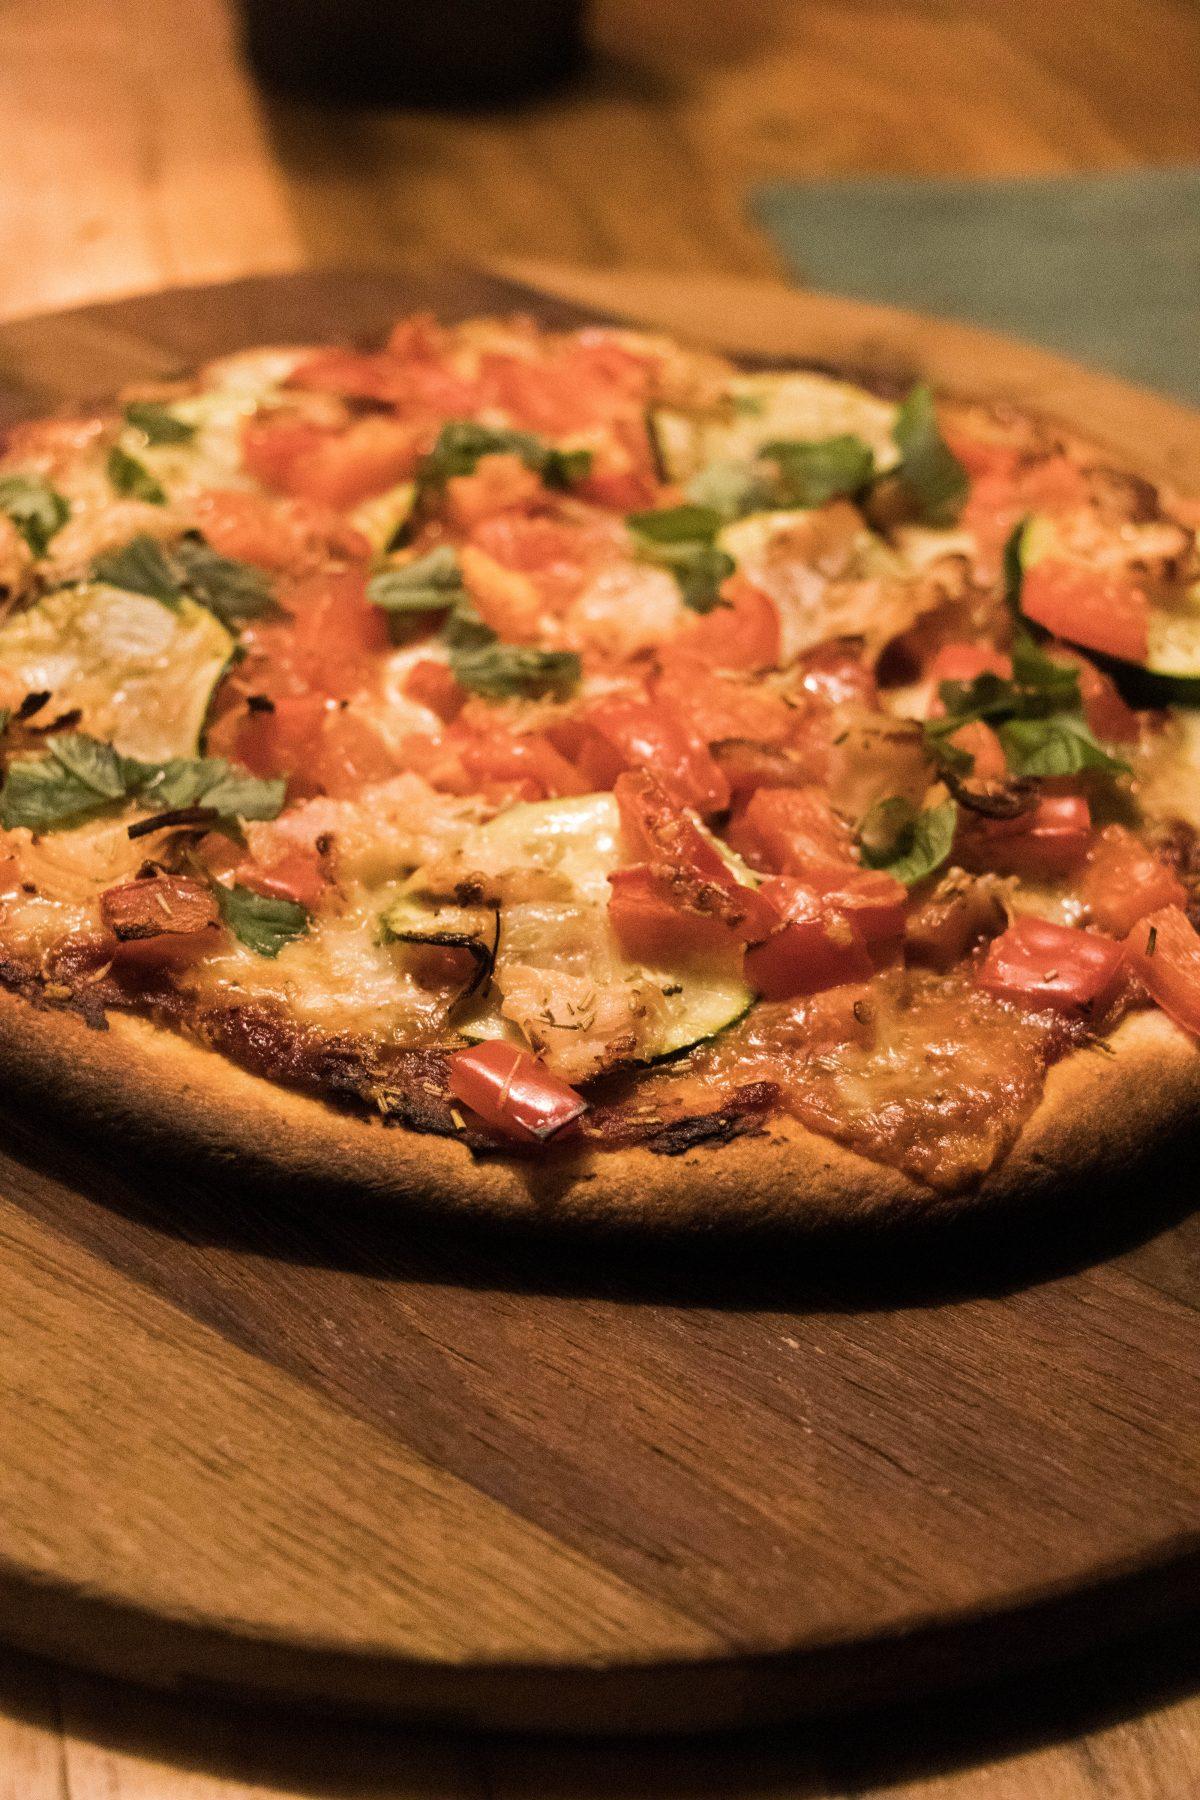 Bloemkoolpizza met buffelmozzarella, paprika en verse basilicum